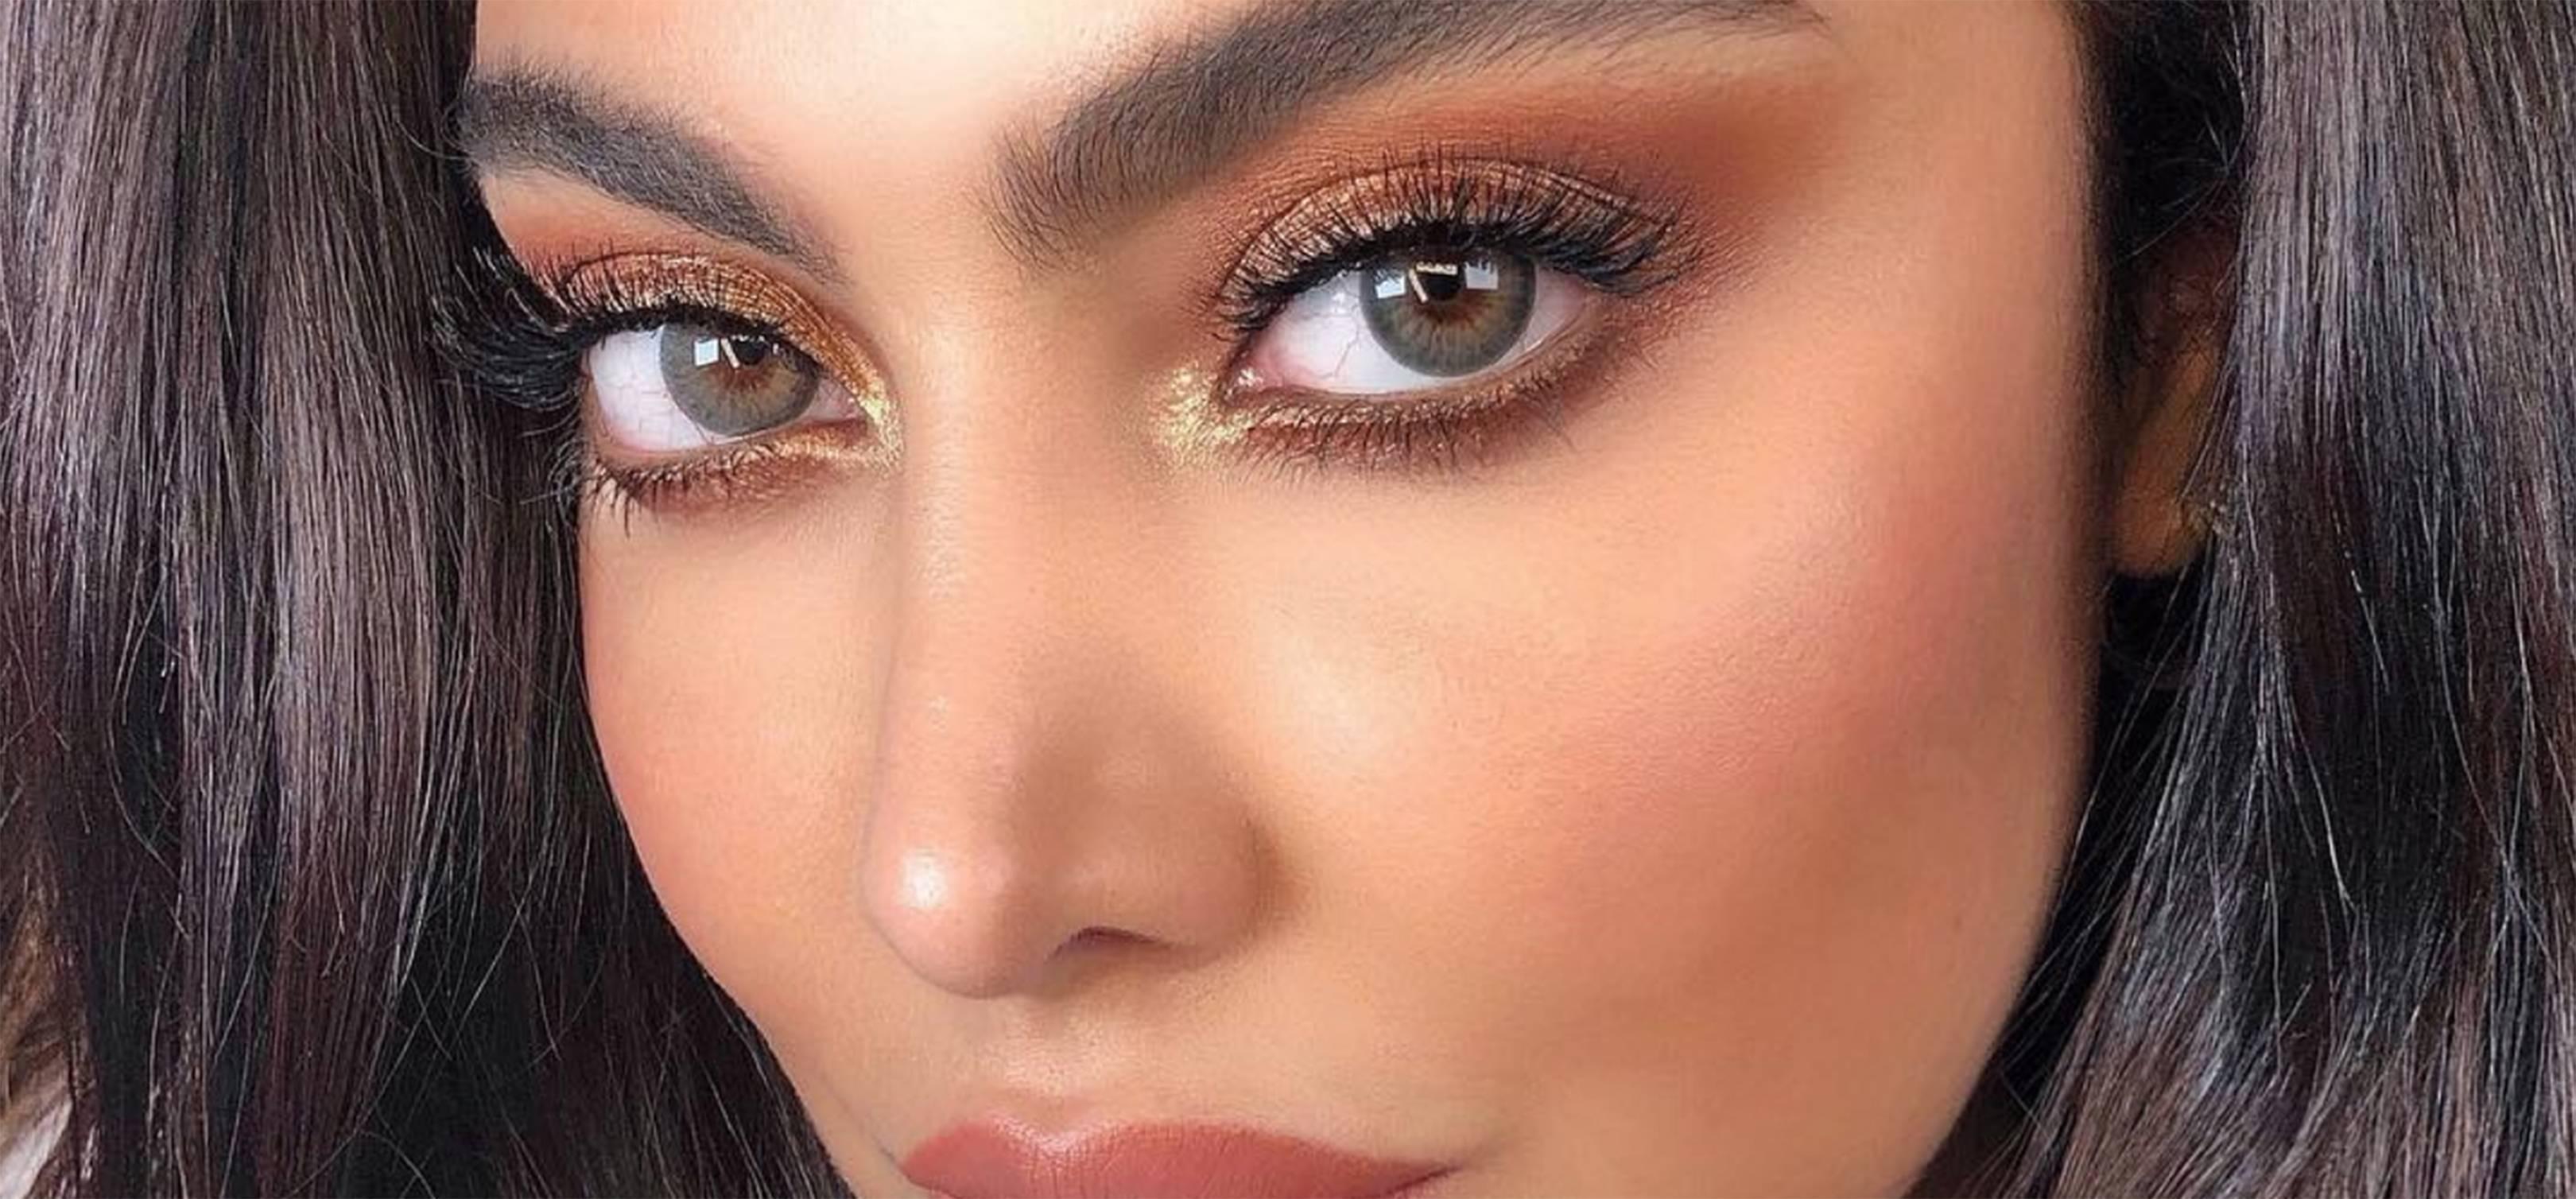 Wedding Makeup Looks.Charlotte Tilbury S Best Wedding Makeup Tips For Brides Glamour Uk